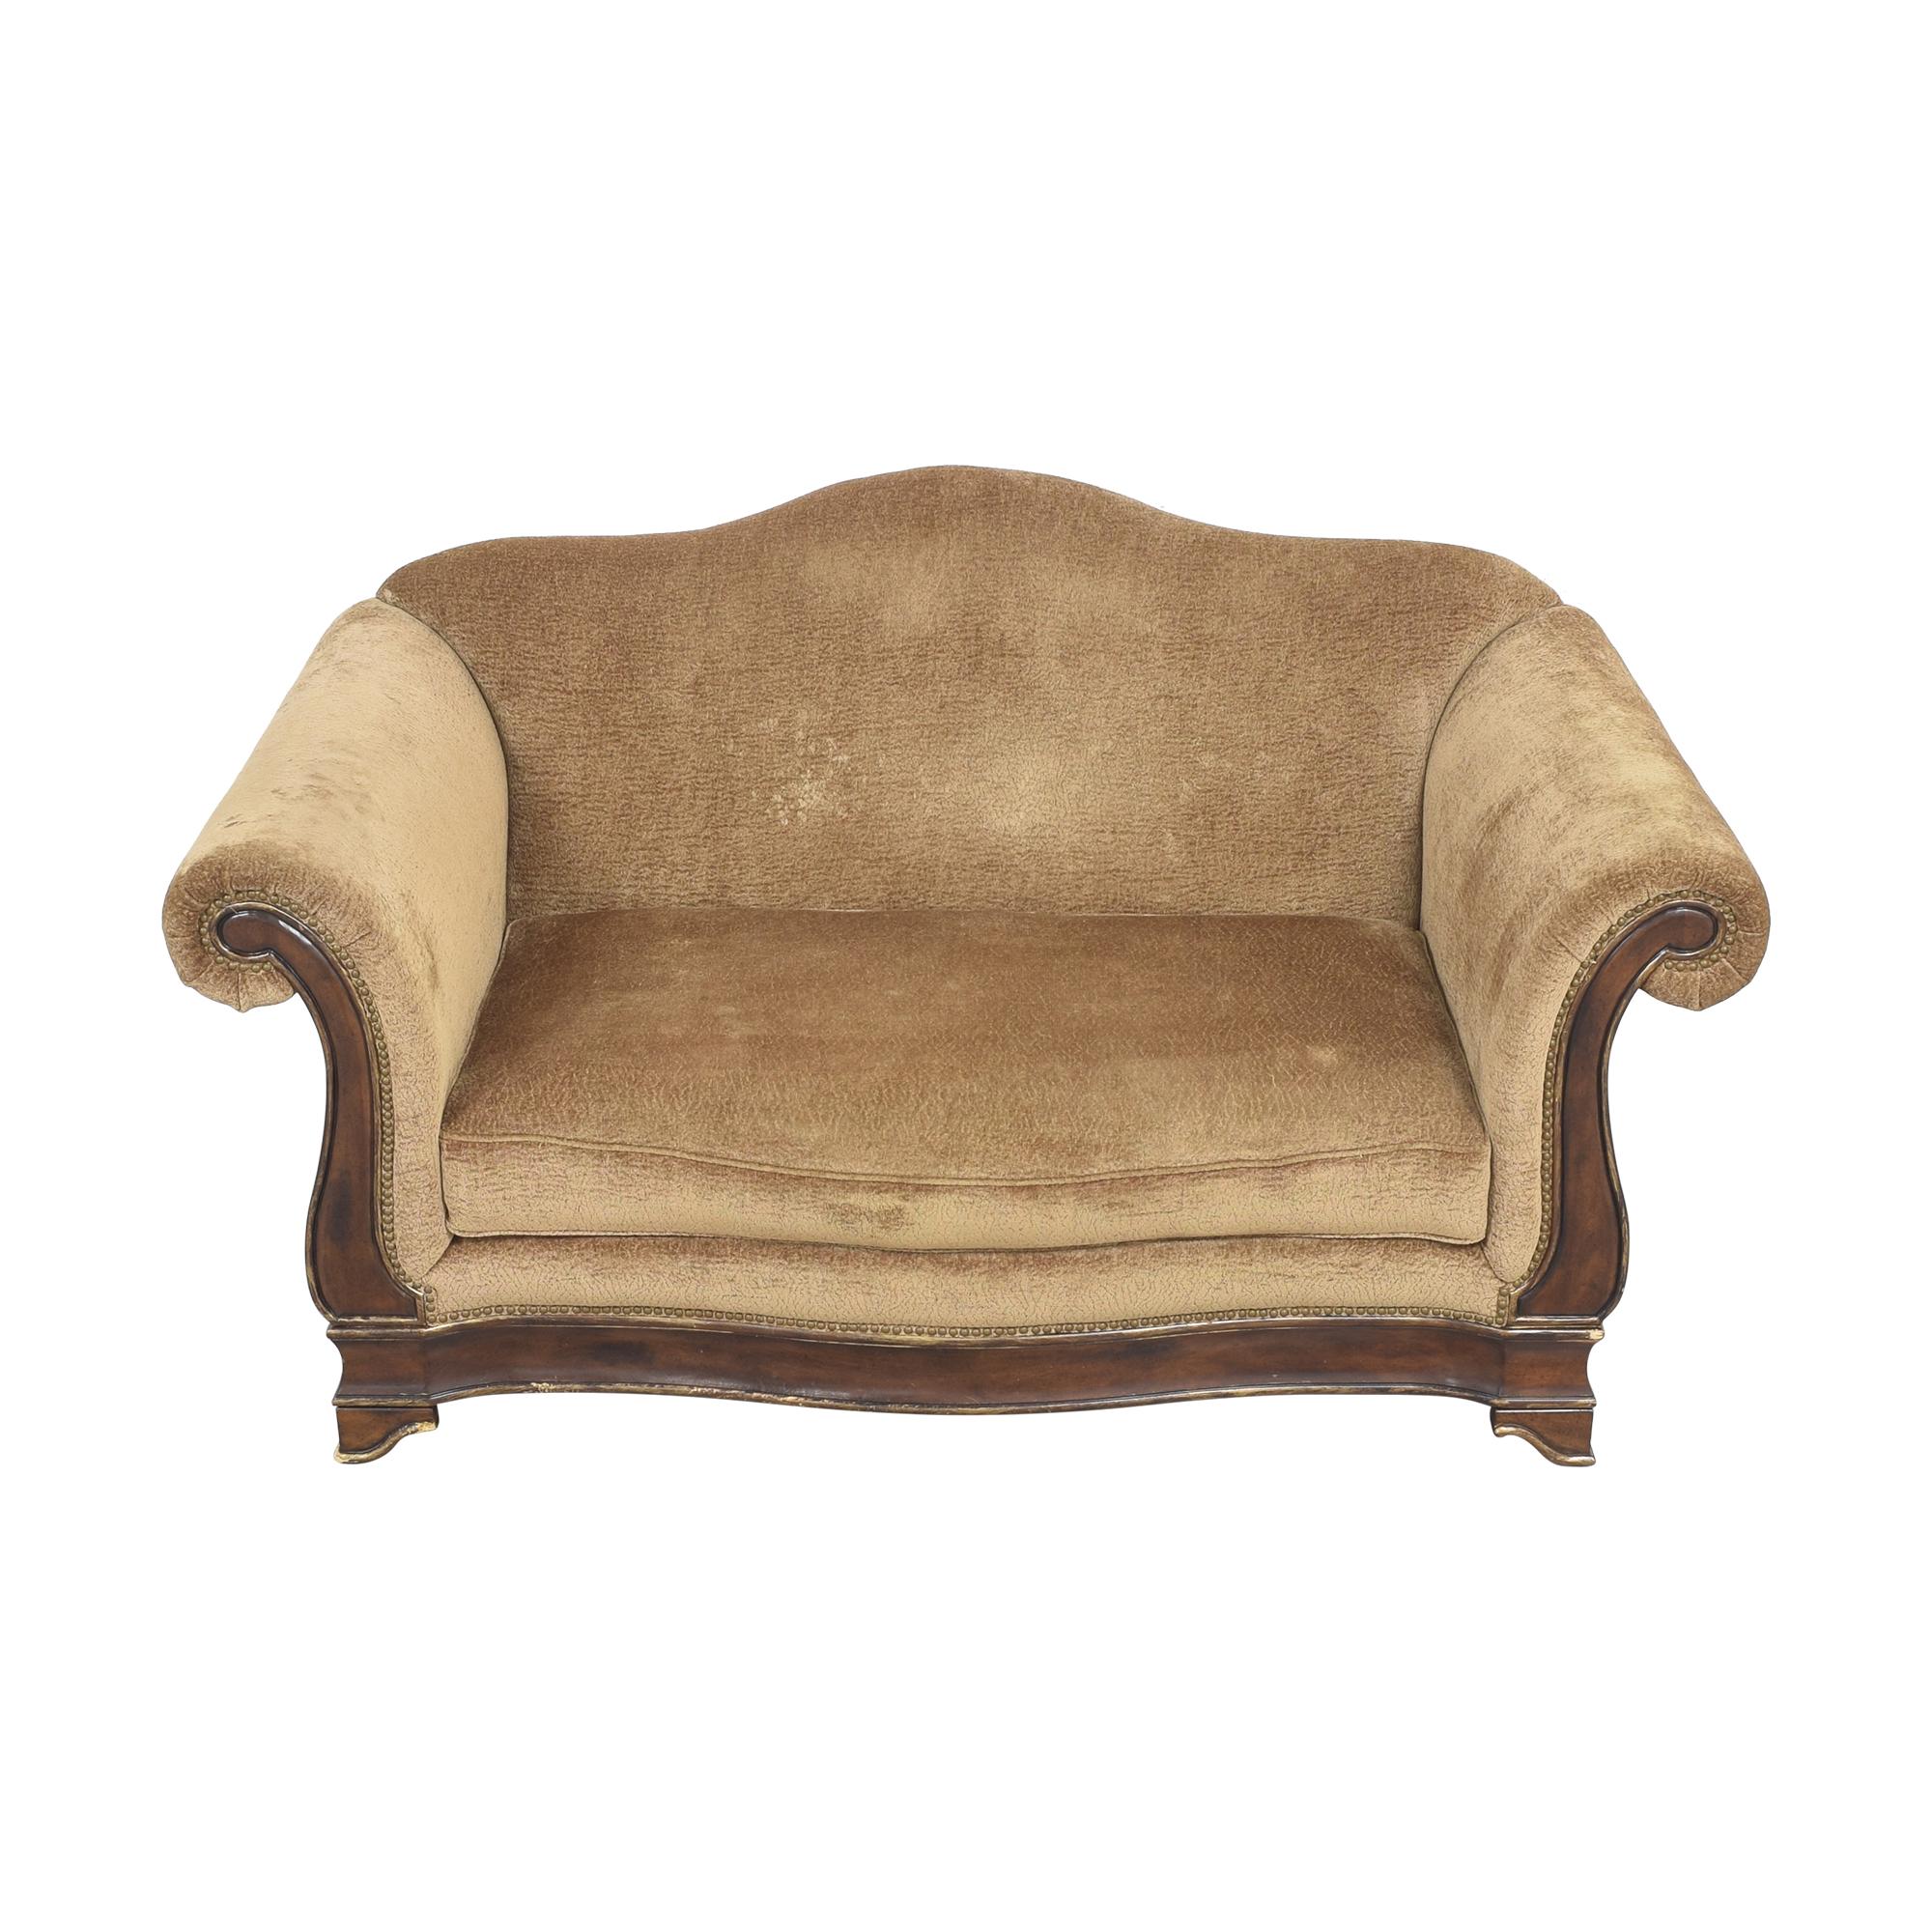 Markor International Camelback Sofa / Classic Sofas